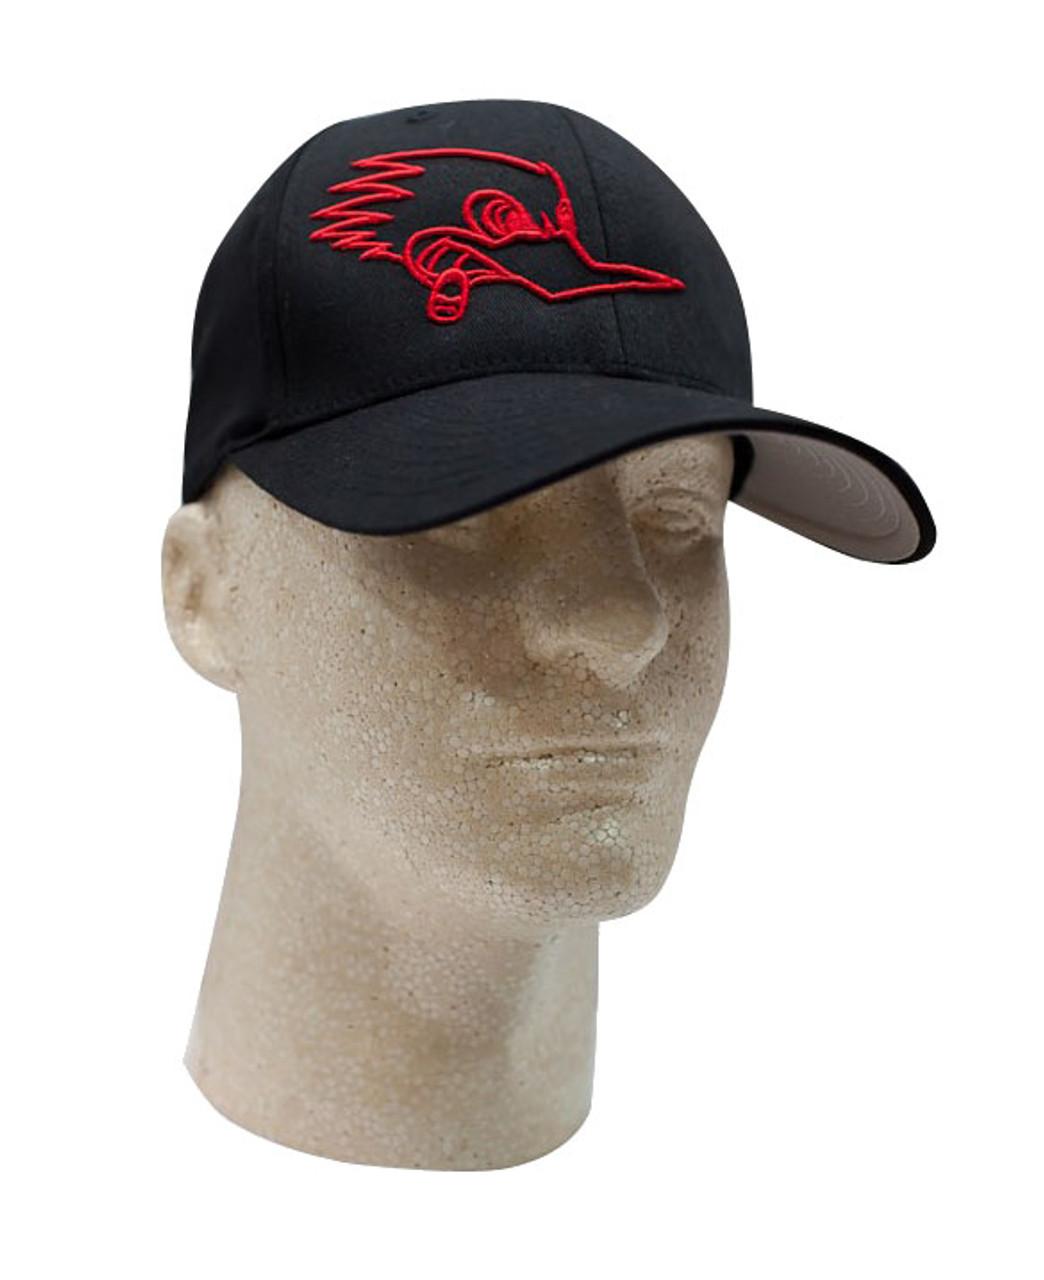 Mr. Horsepower Red Outline FlexFit Black Hat